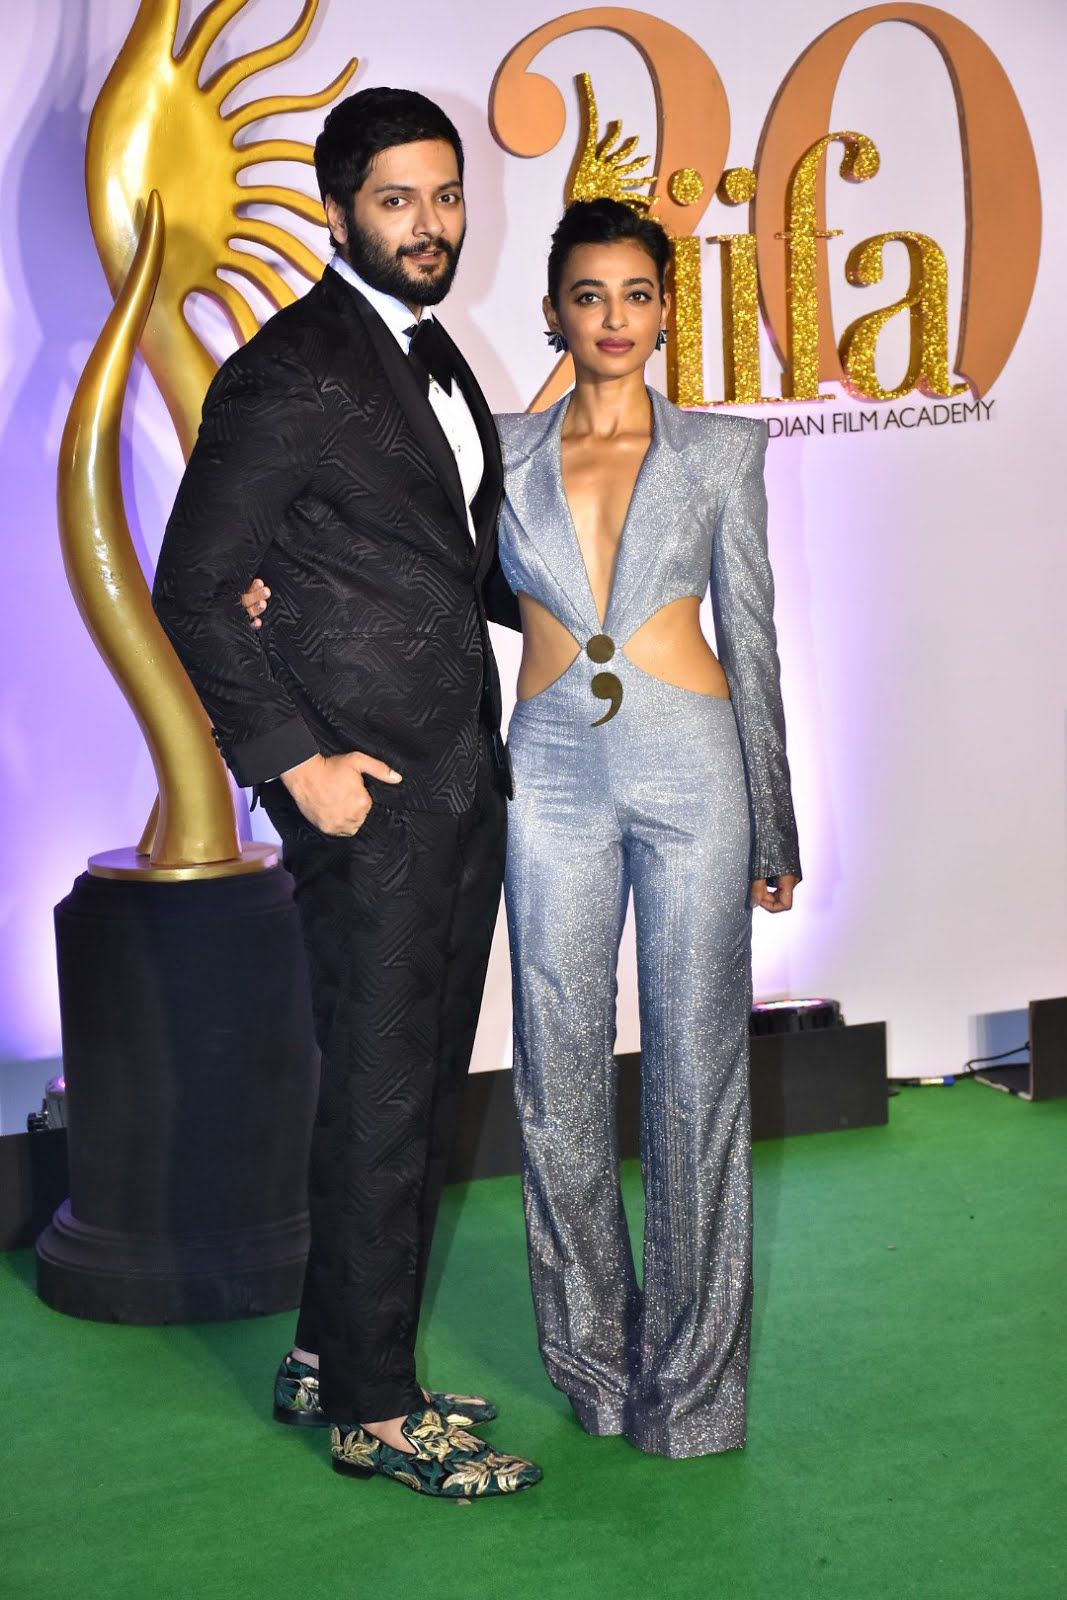 IIFA Awards (2019) Hindi 720p HDRip 1.5GB Full Show